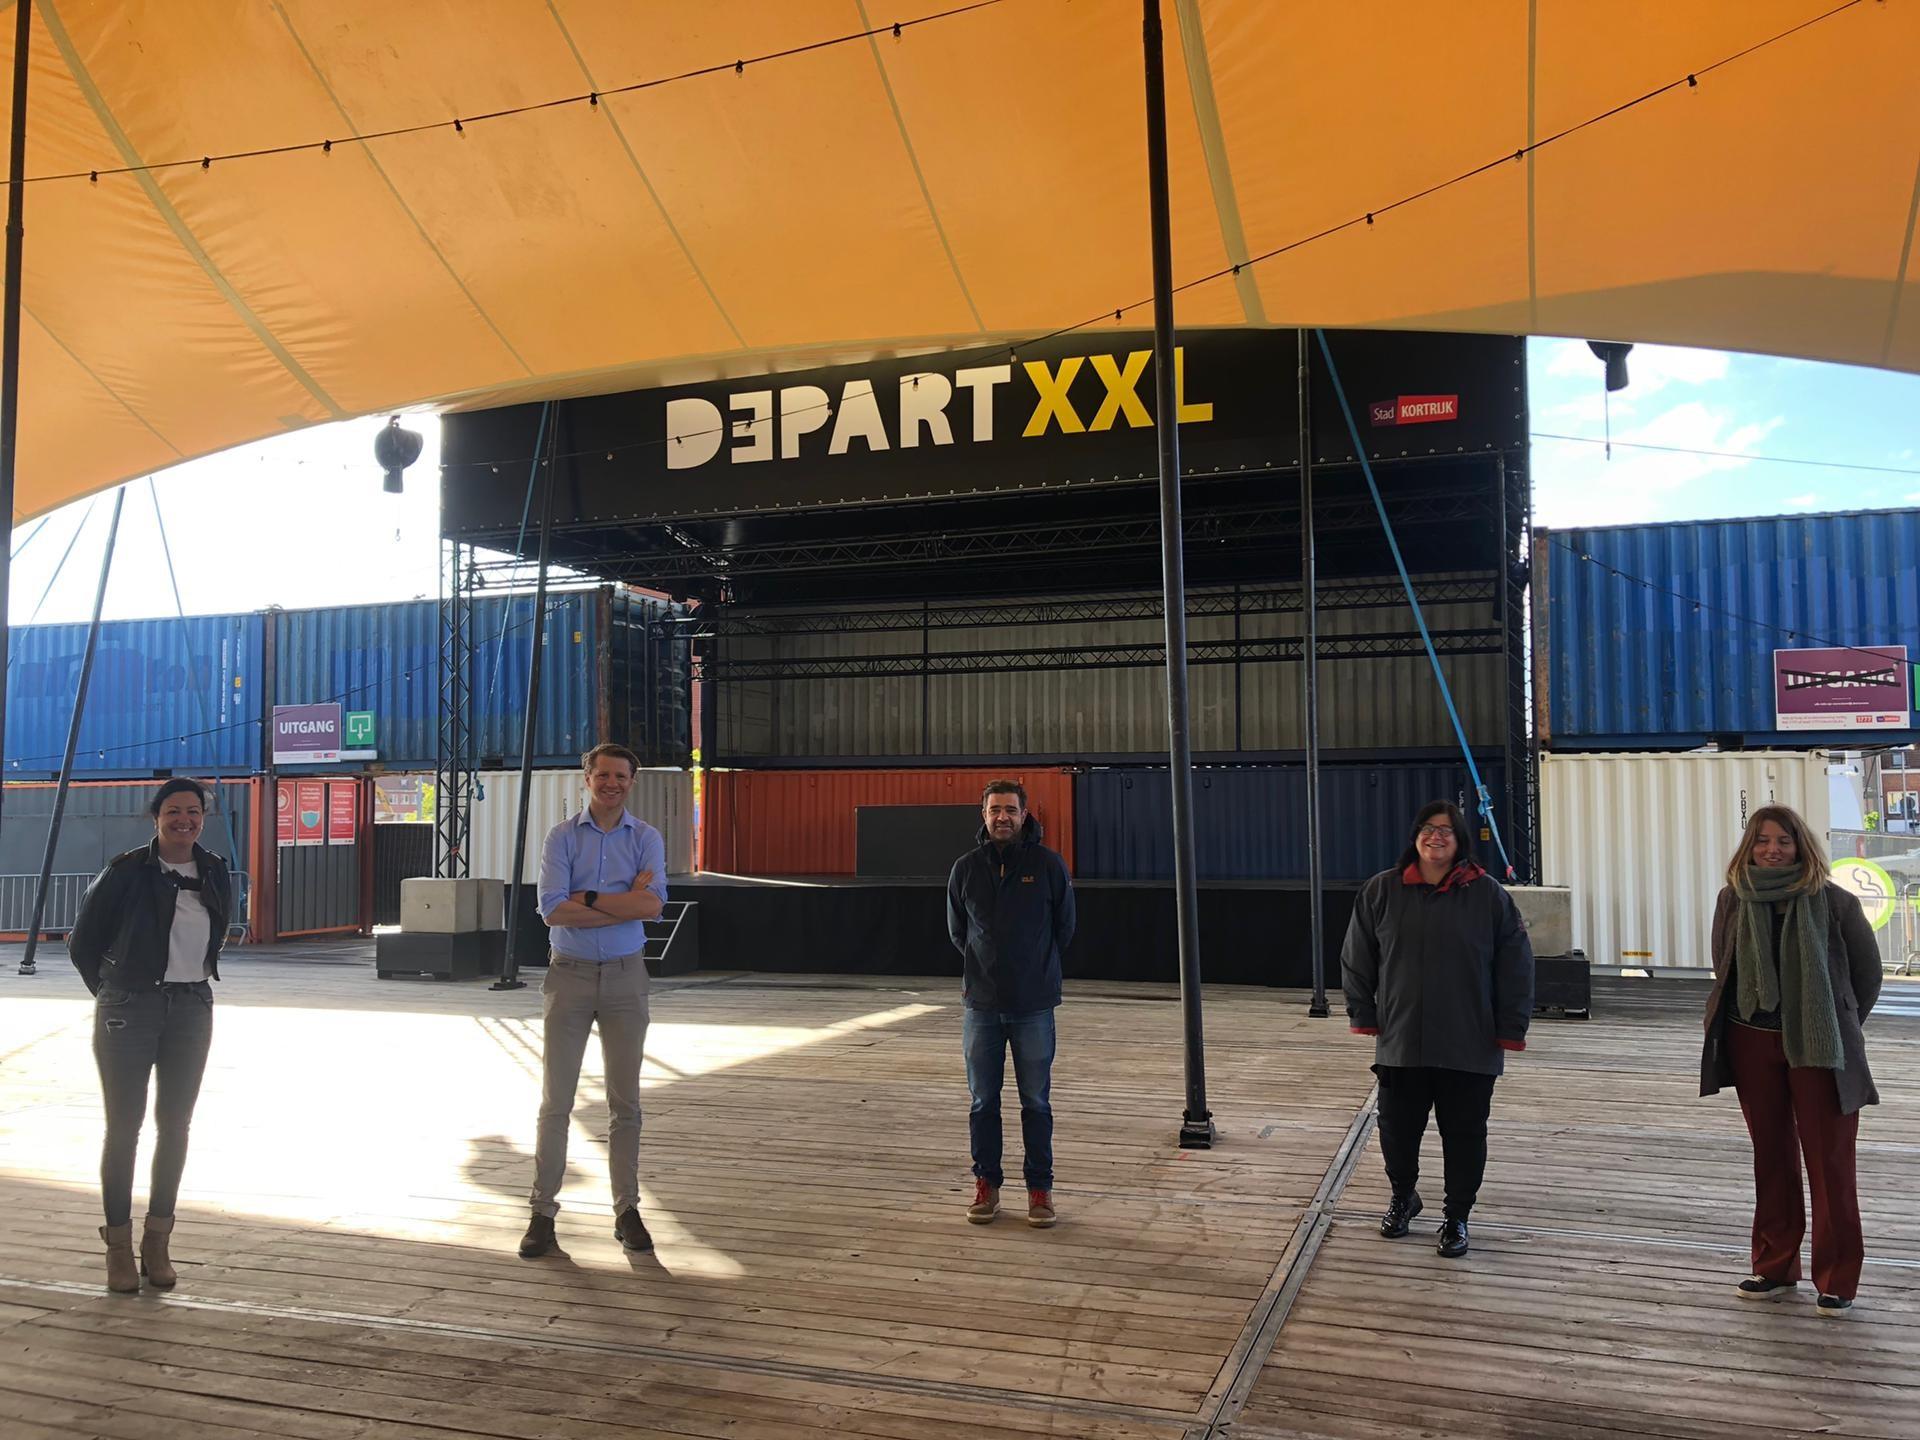 Depart XXL (v.l.n.r.: Kelly Detavernier, Axel Ronse, Hans Vandenberghe, Franceska Verhenne, Sofie Vermandere)